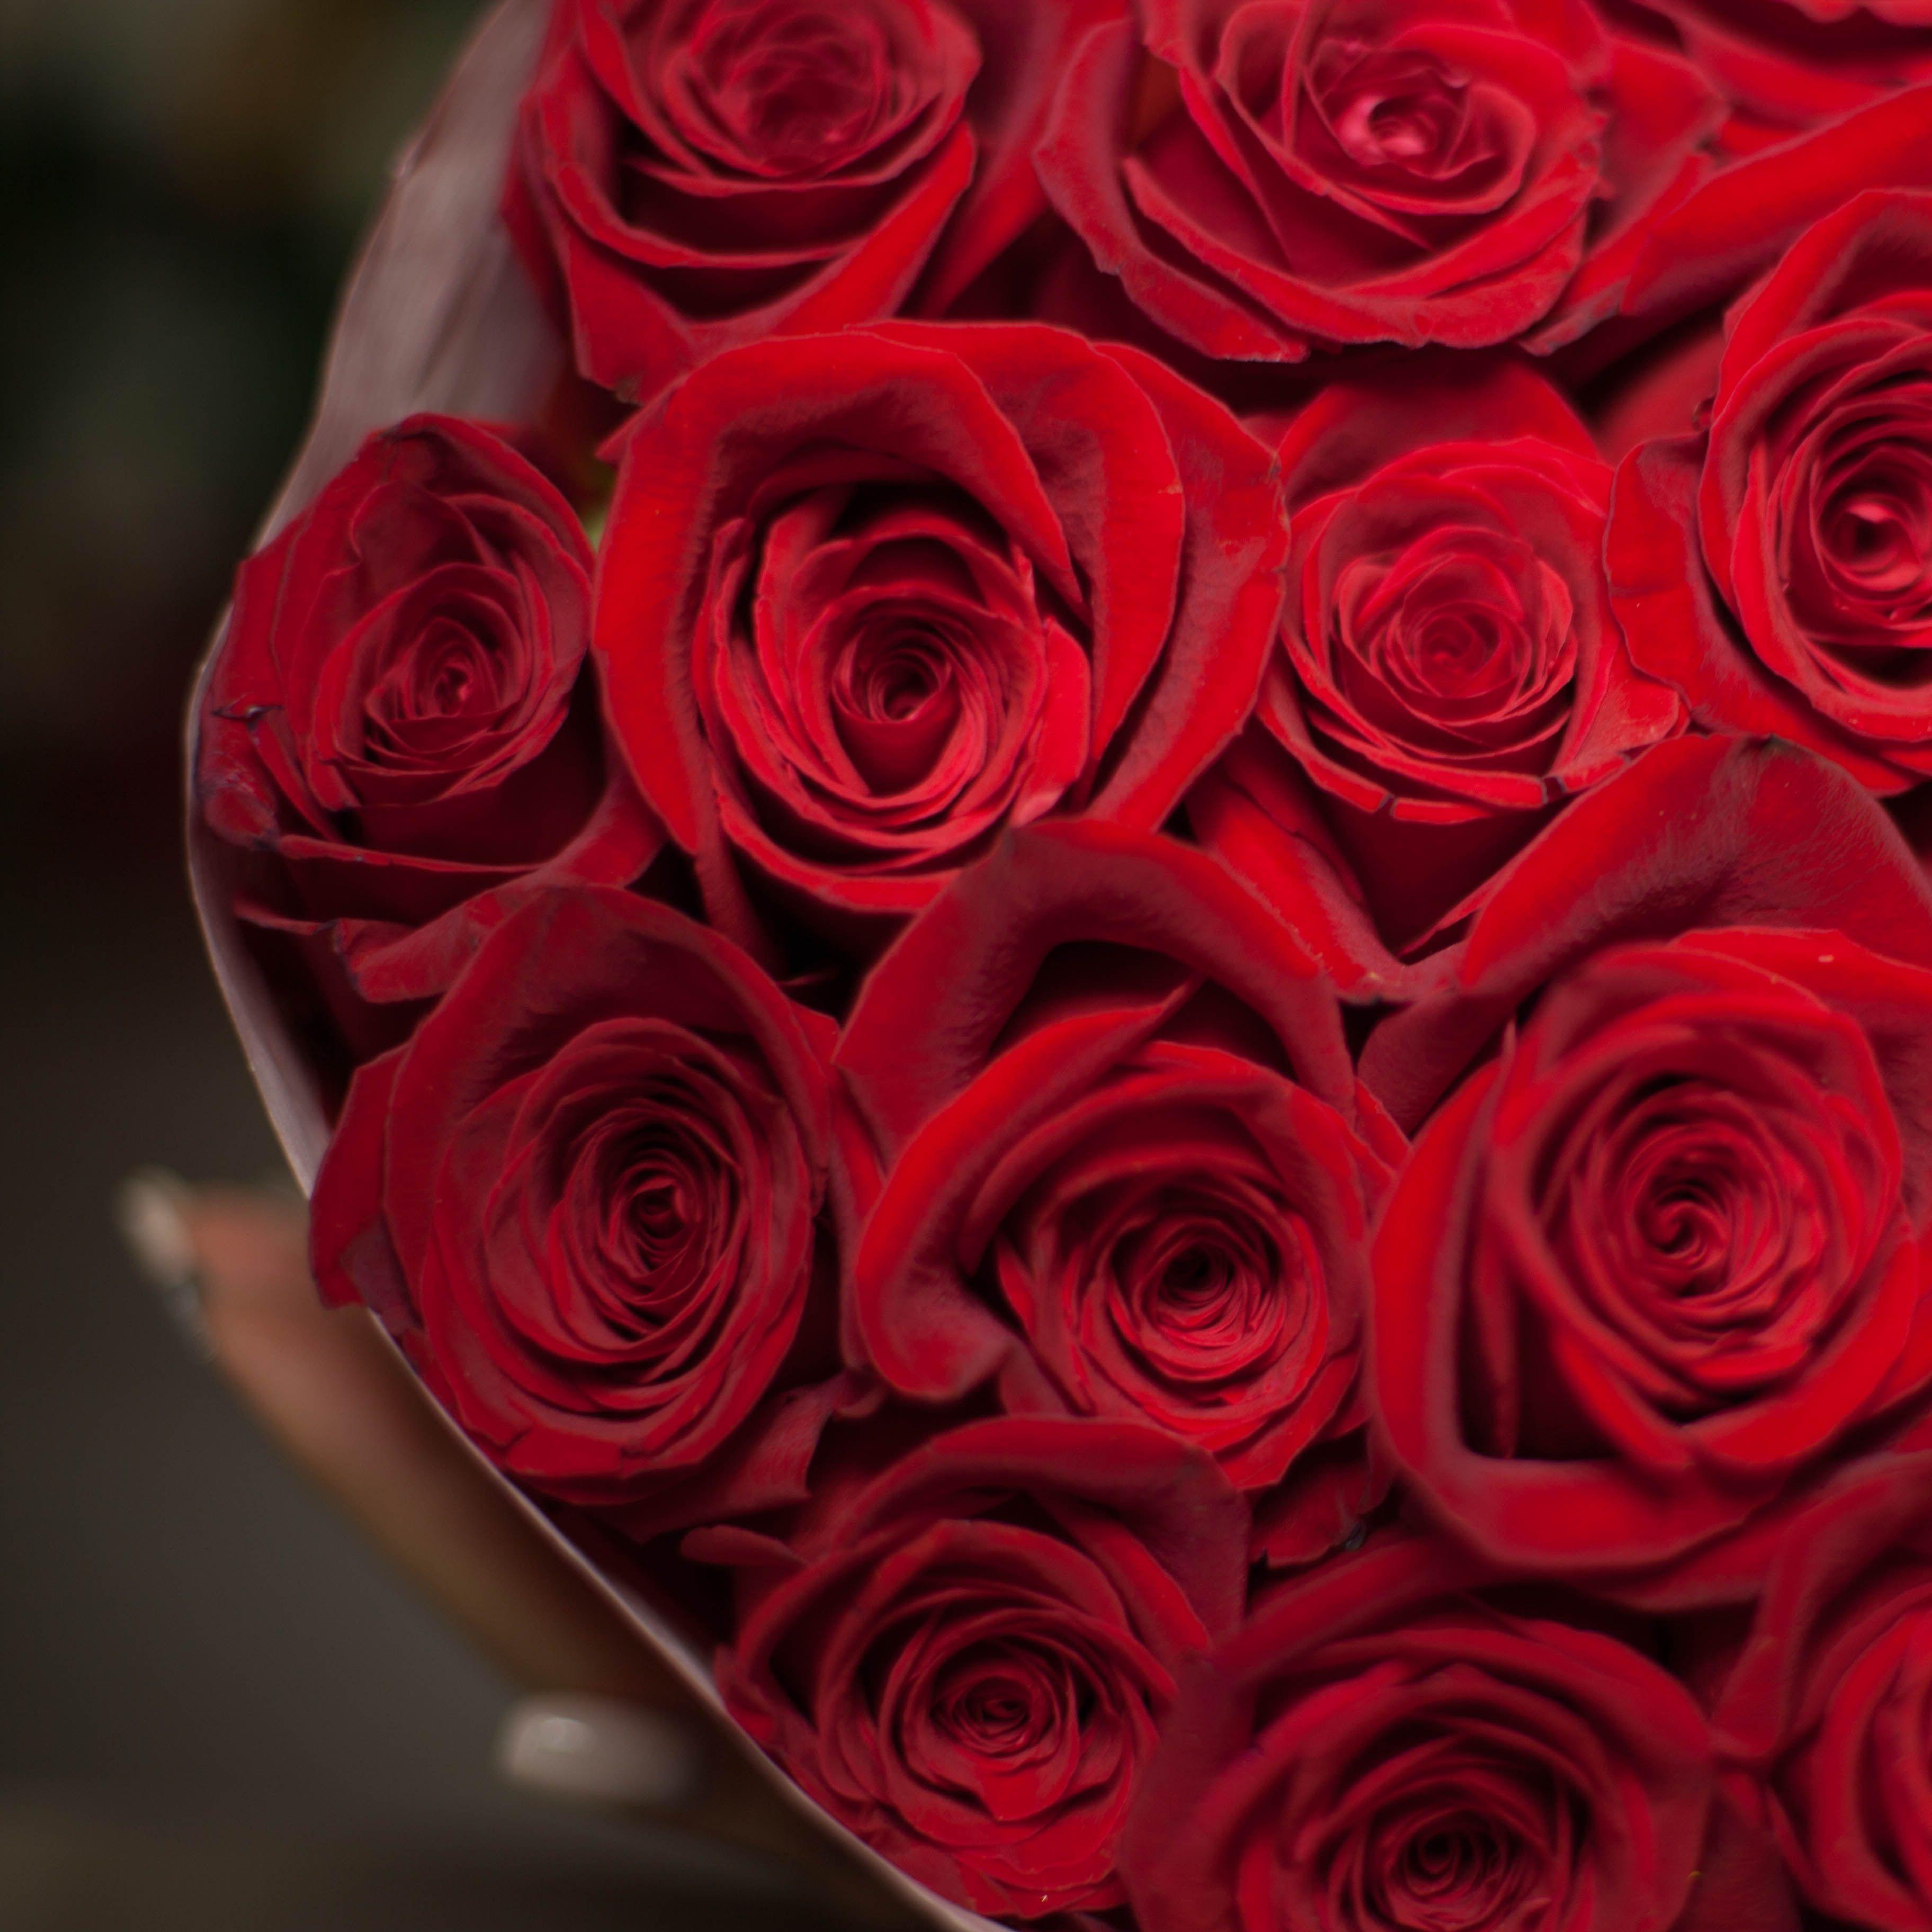 17 красных роз Freedom 60 см фото